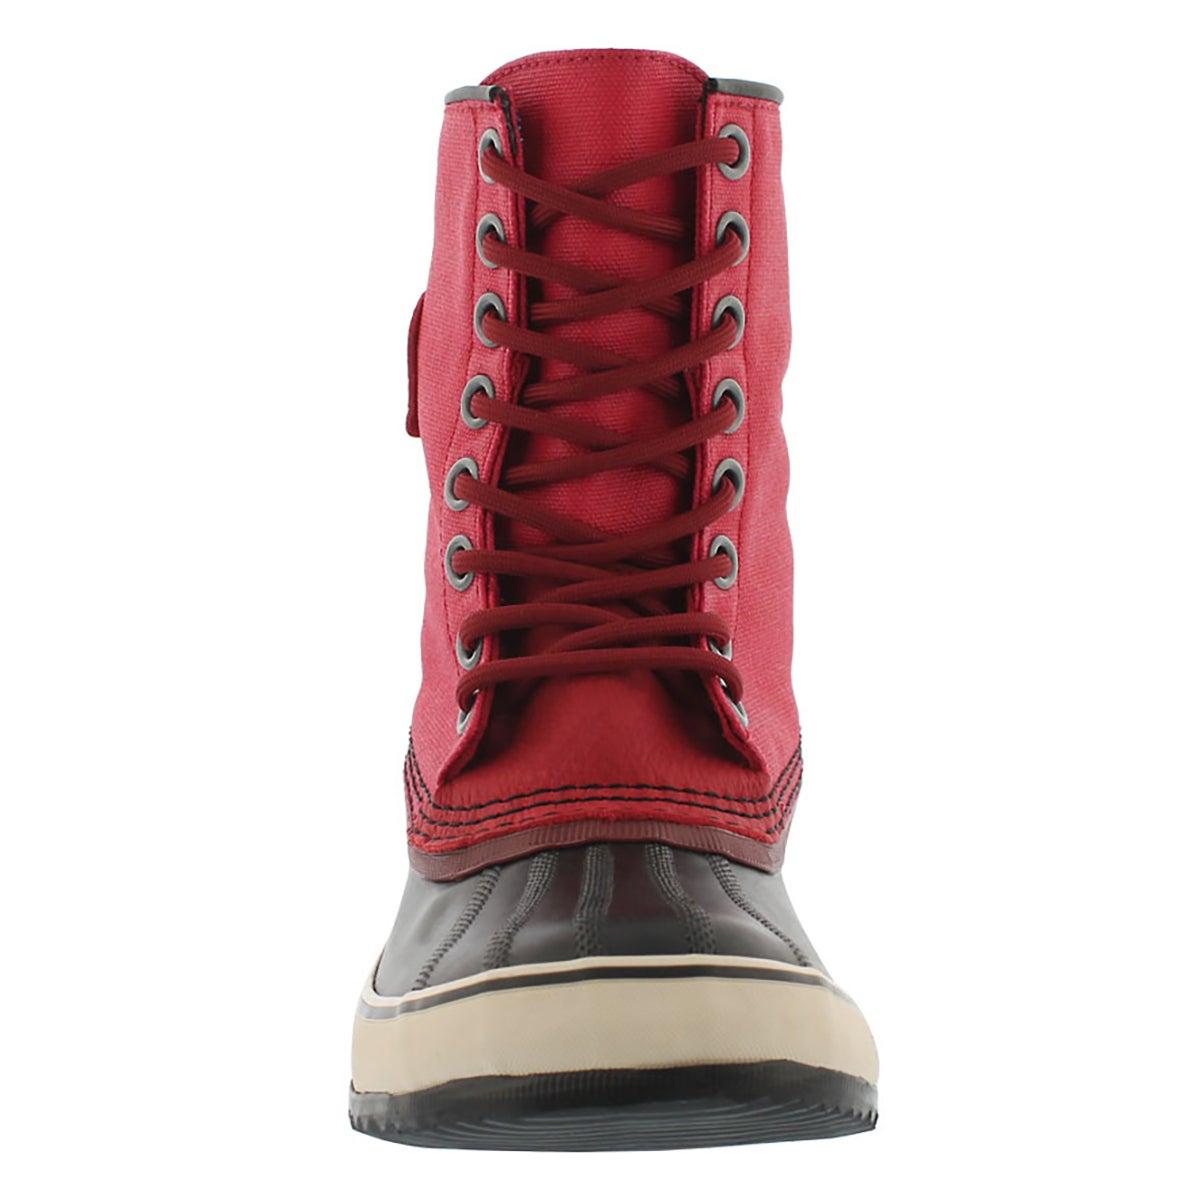 Lds 1964 Premium CVS red winter boot